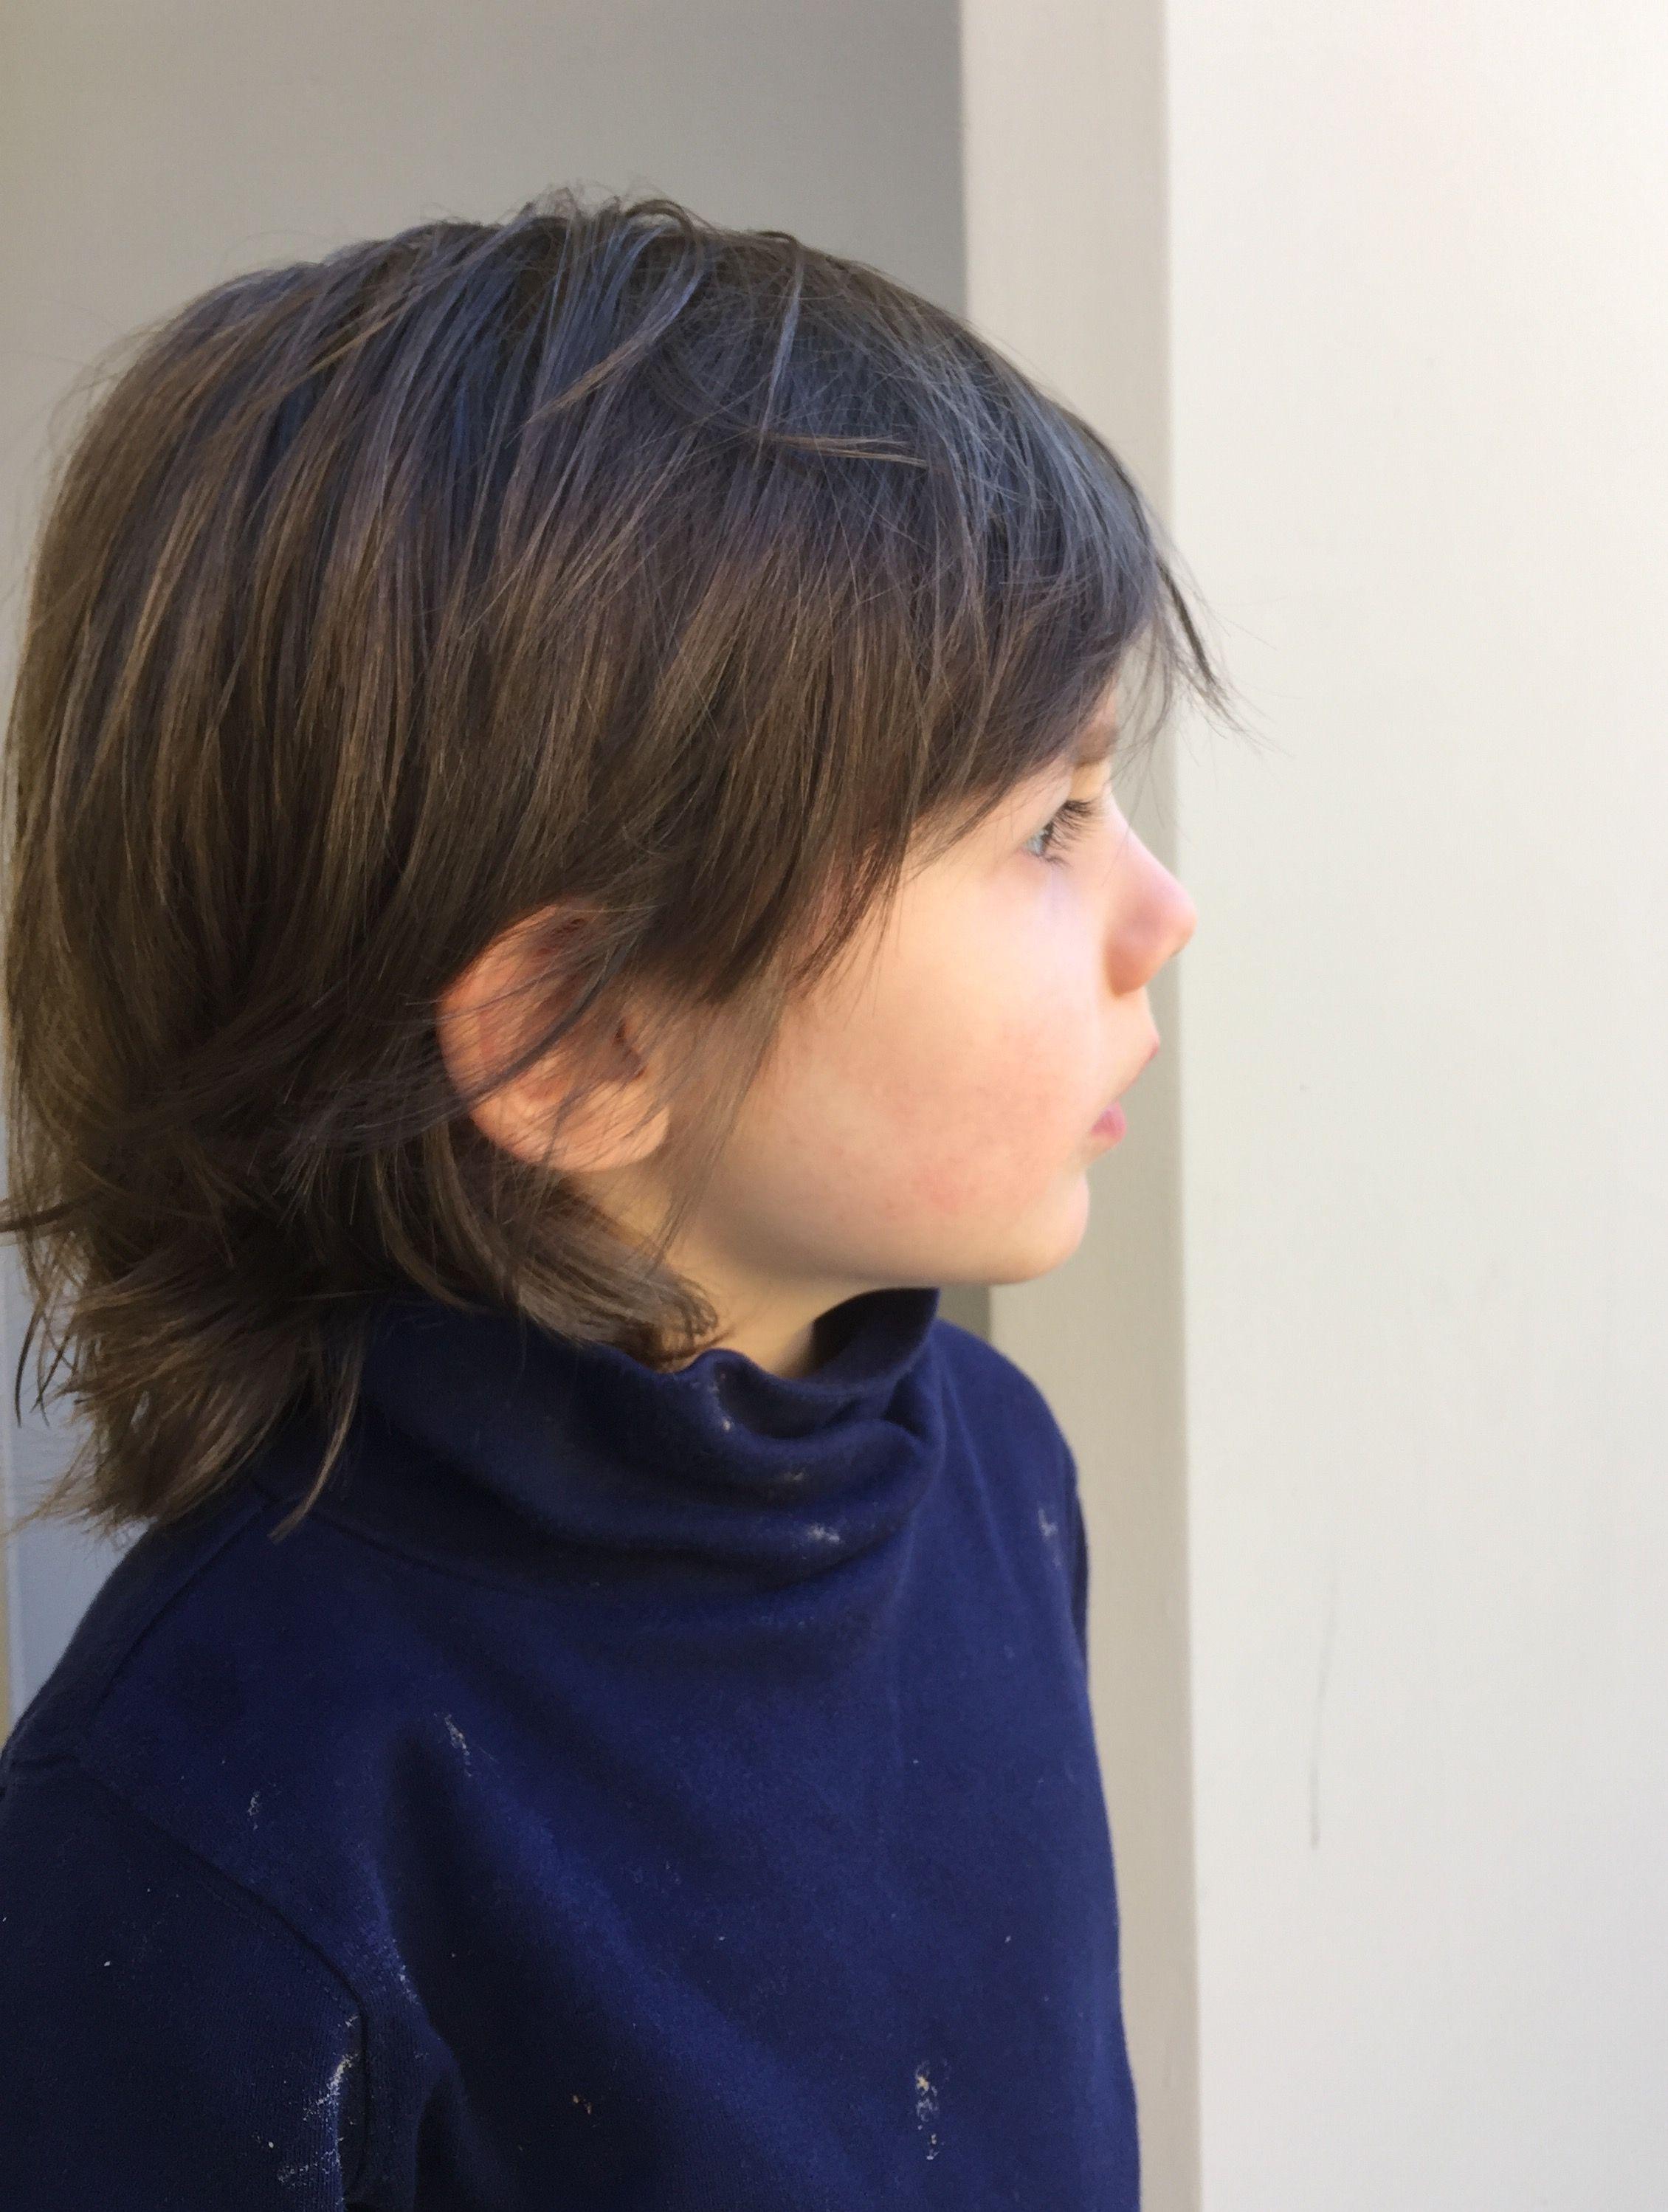 Long Layered Little Boy Haircut Boys Long Hairstyles Boy Haircuts Long Haircuts Straight Hair